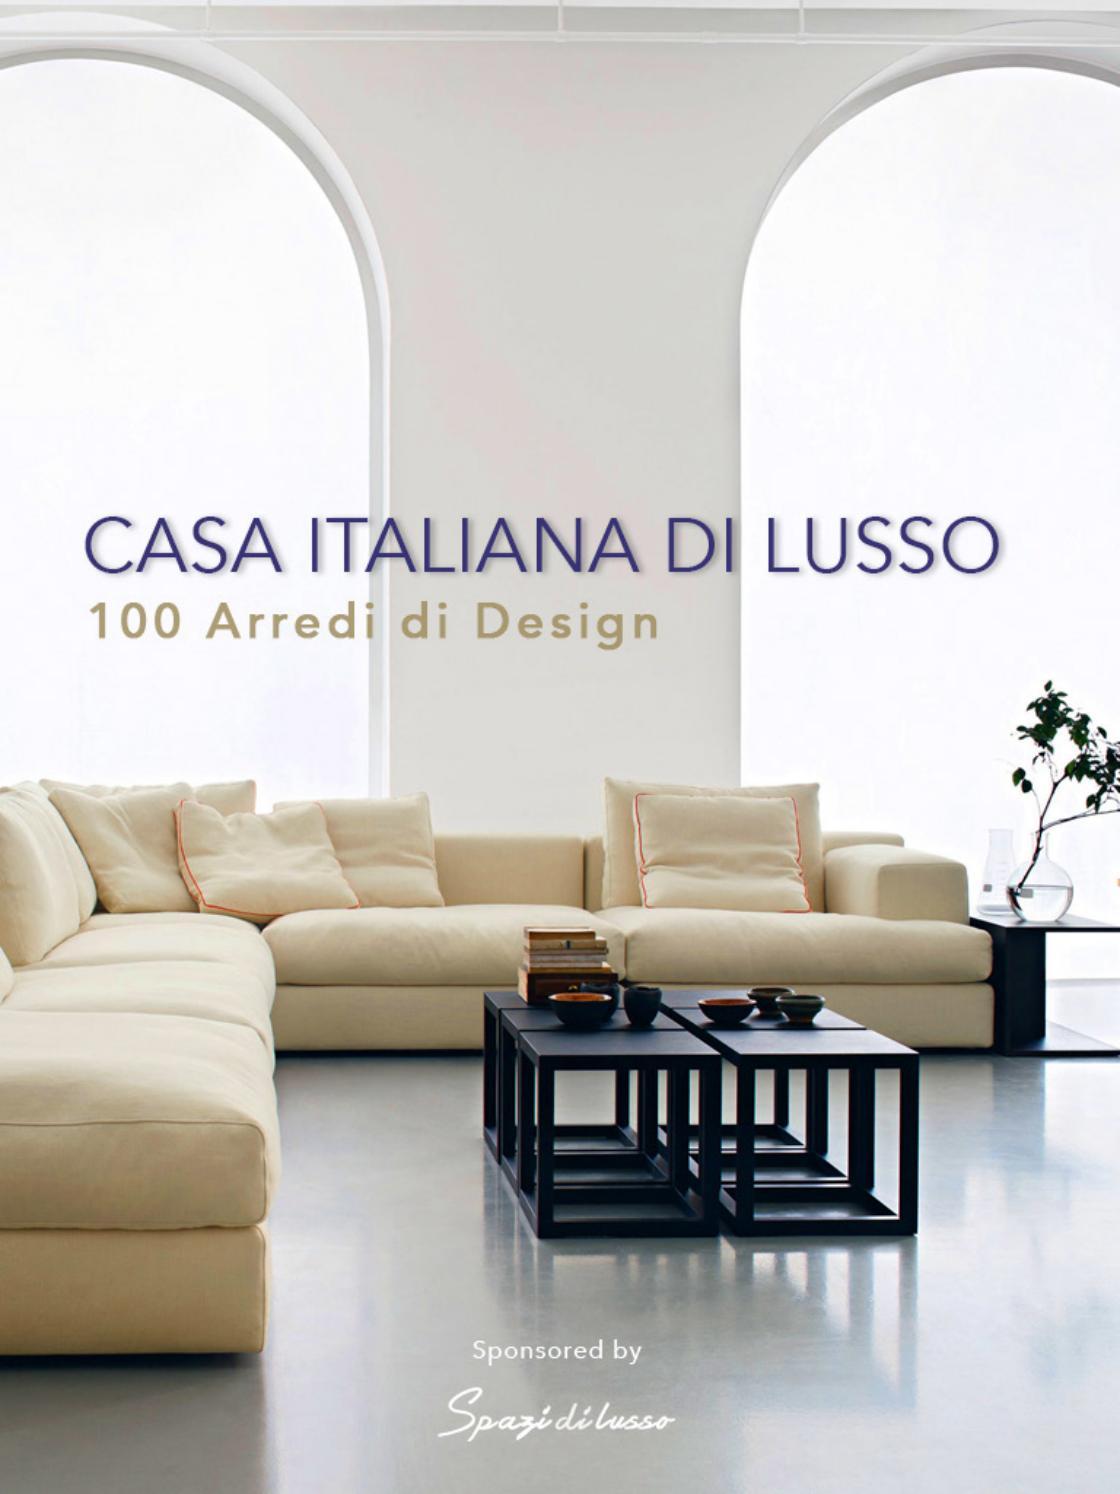 Arredamento Di Design ebook casa italiana di lusso –100 arredi di design by